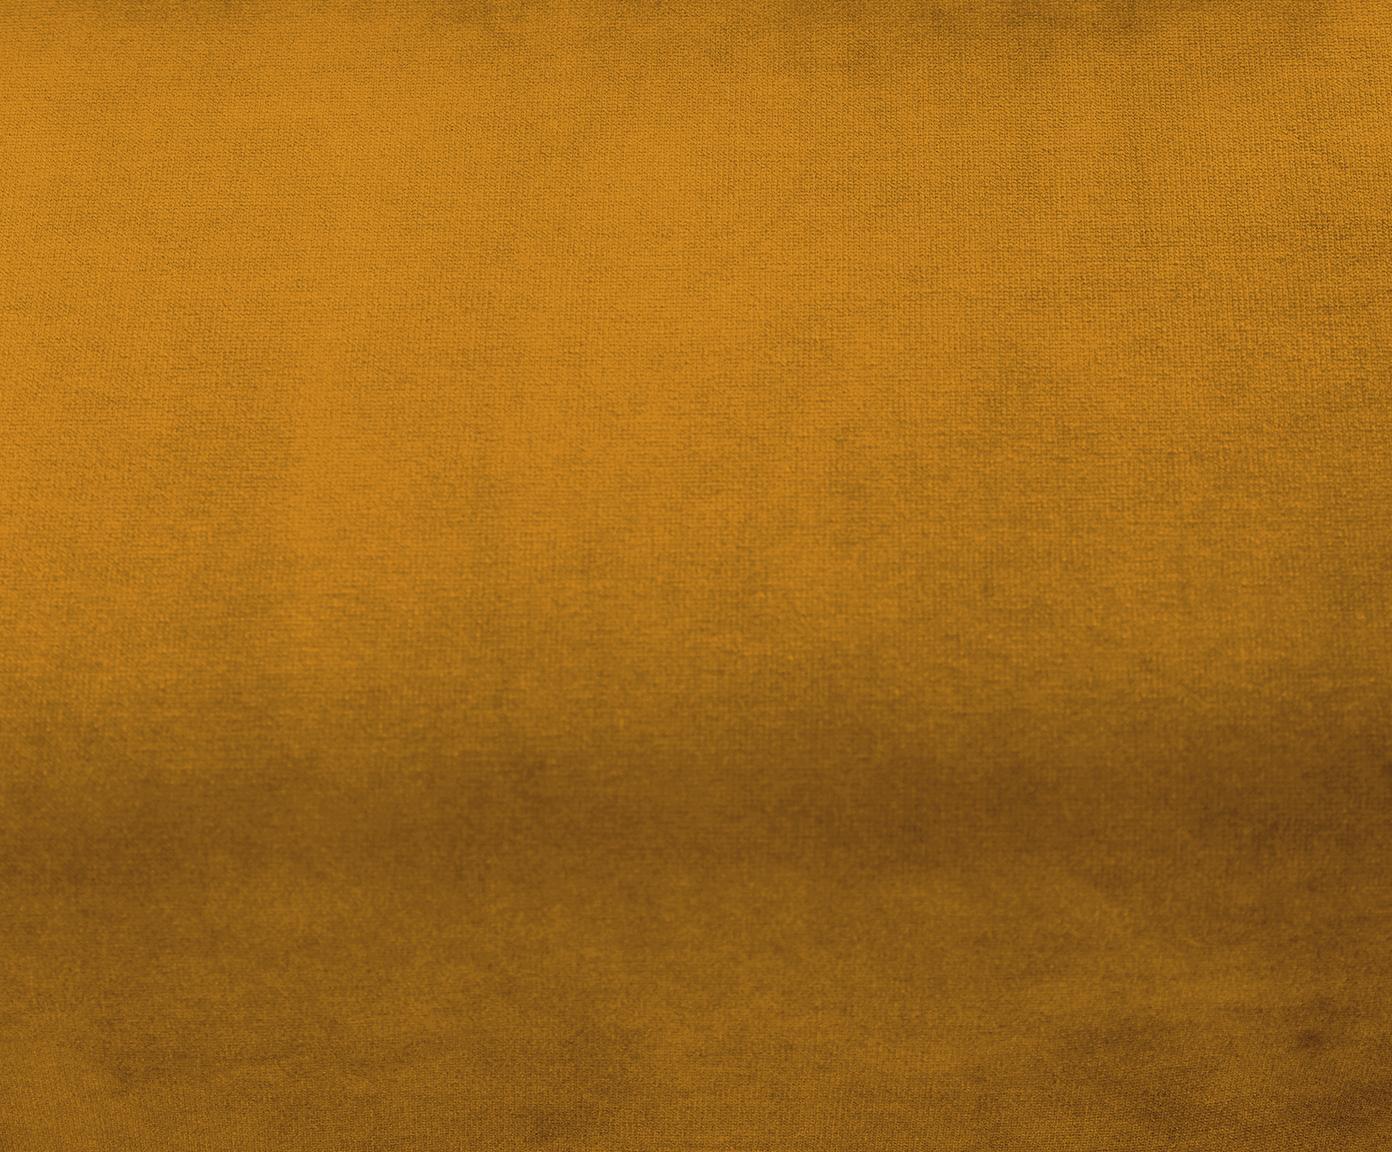 Samt-Ecksofa Moby, Bezug: Samt (Hochwertiger Polyes, Gestell: Massives Kiefernholz, Samt Senfgelb, B 280 x T 160 cm